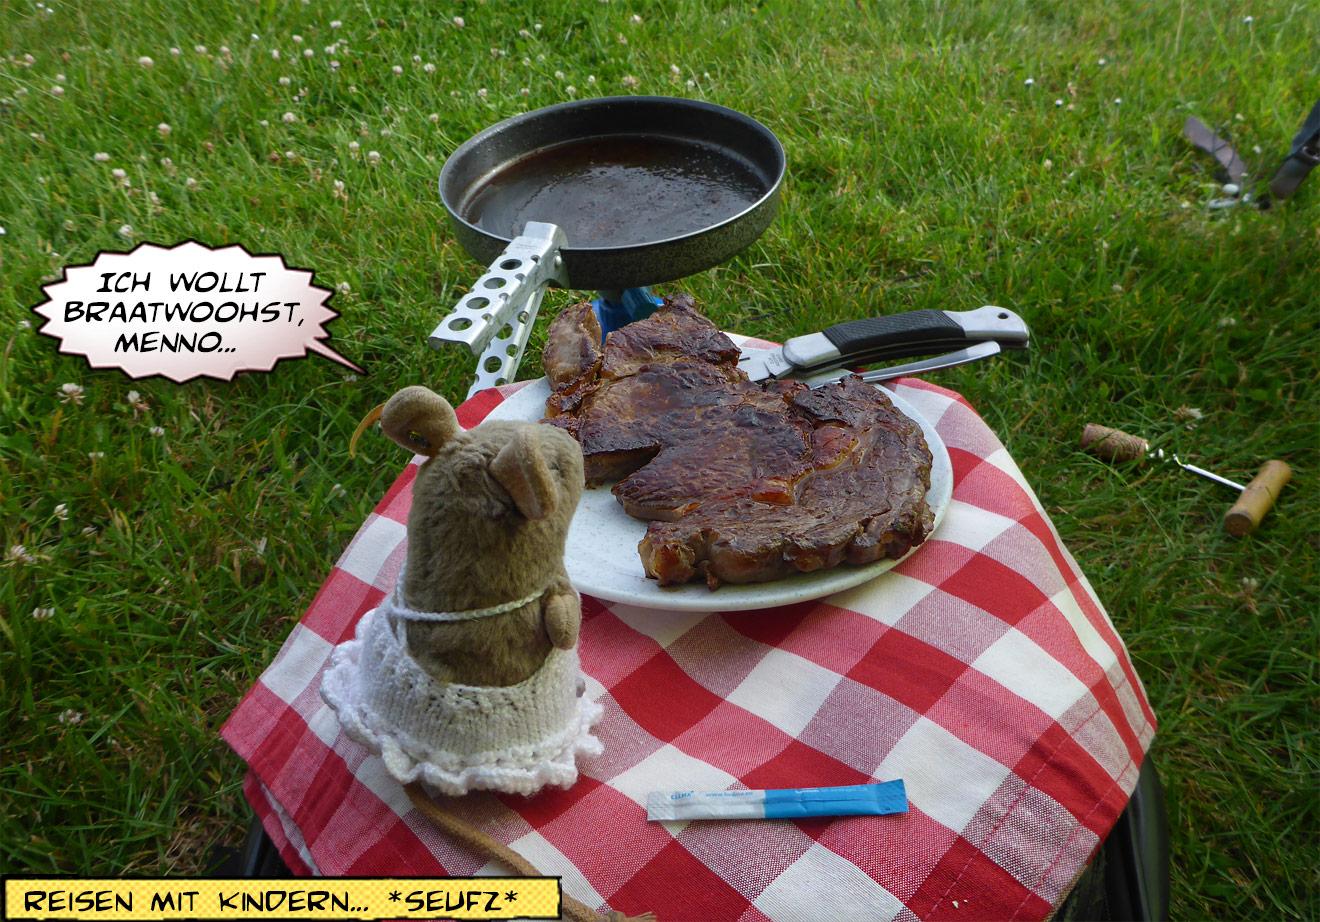 Picknick mit Entrecote vorm Zelt